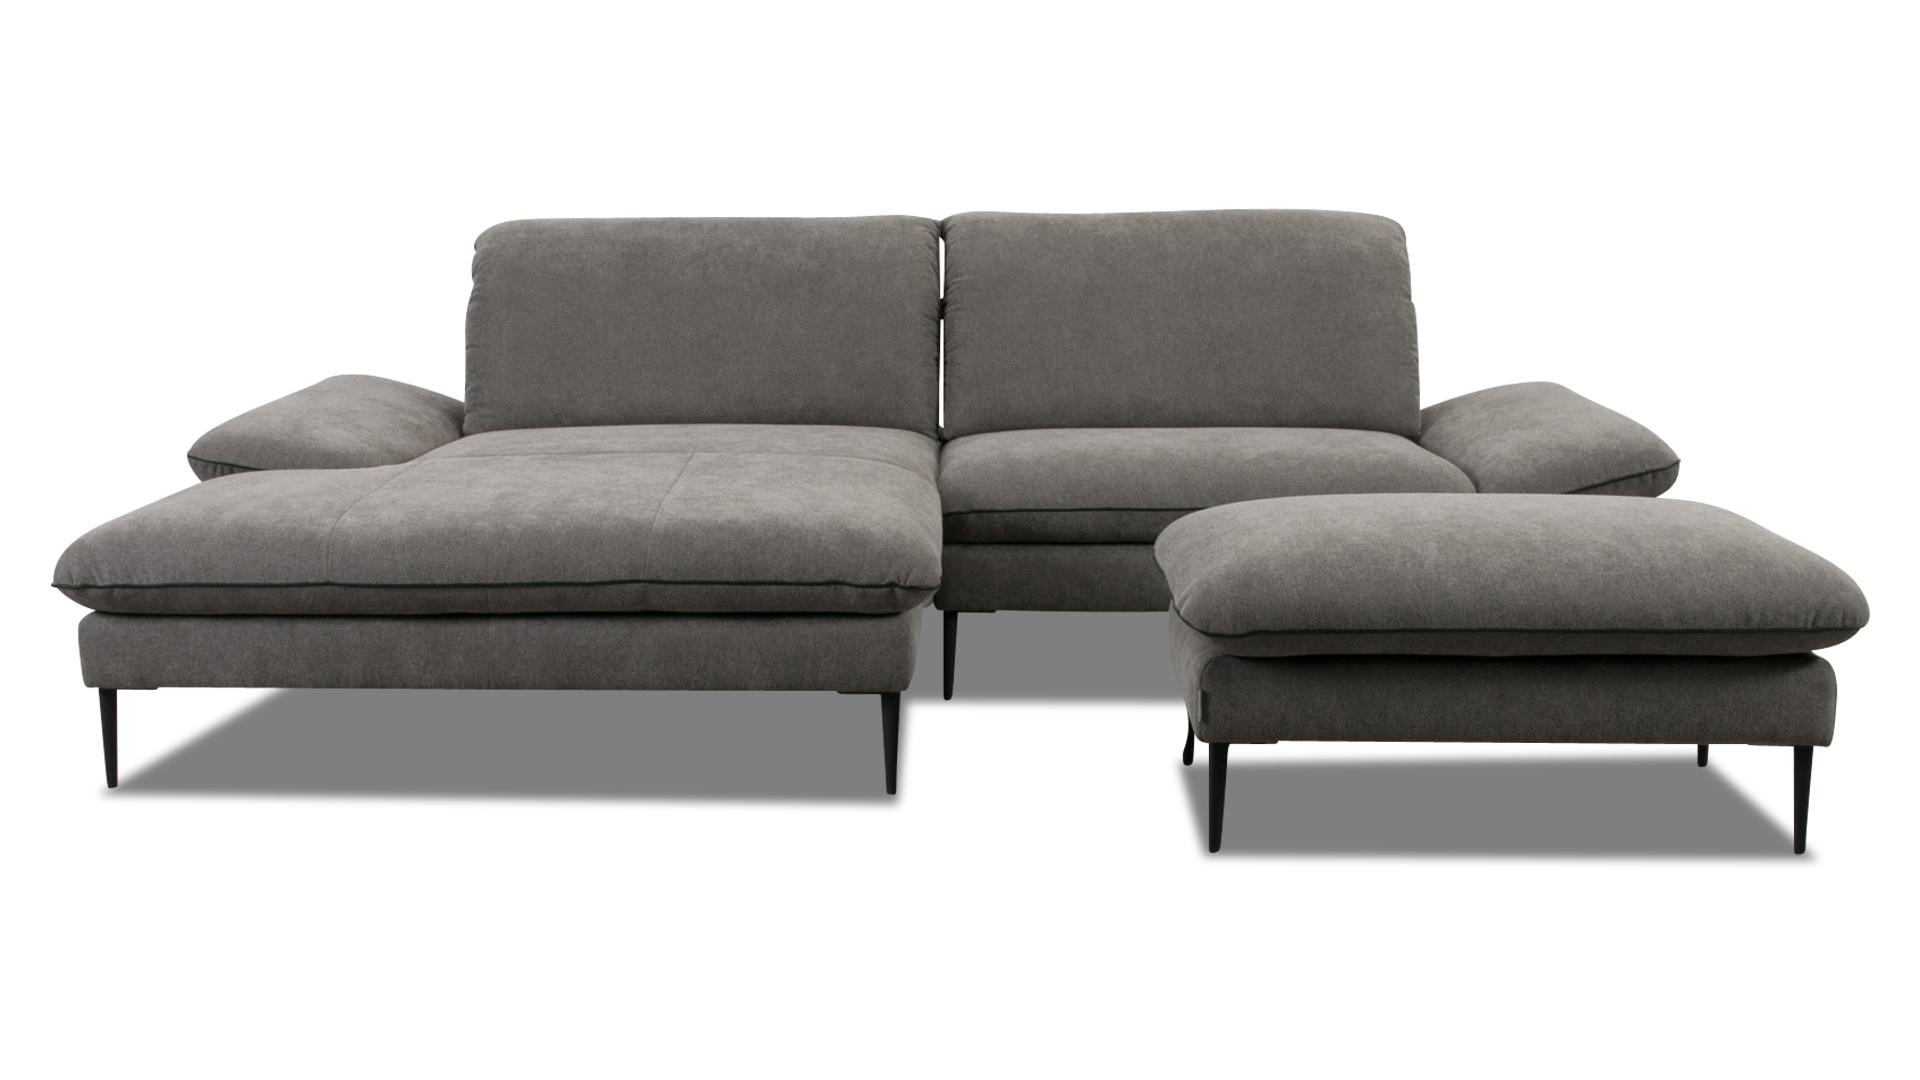 Full Size of Megapol Sofa Konfigurator Lomo Antaris Armstrong Canto Linos Argo Spike Artus Fenster Online Regal Wohnzimmer Megapol Konfigurator